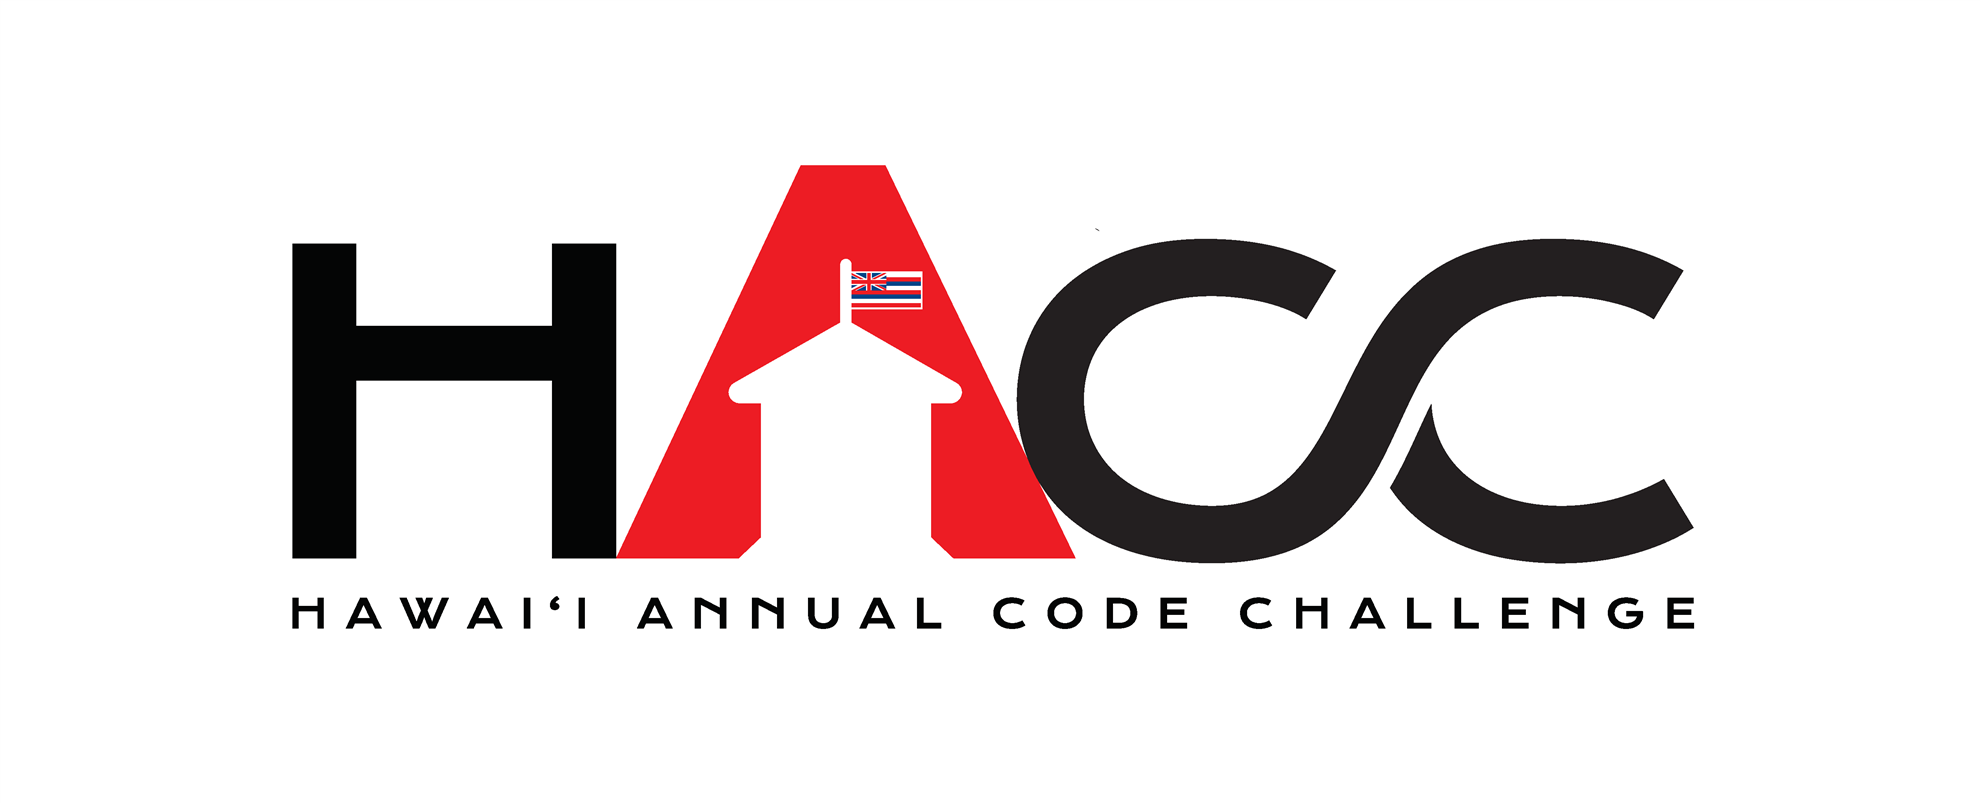 Hawaii Annual Code Challenge (HACC) - Educator Training Camp Series Overview (CSTA Hawaii)